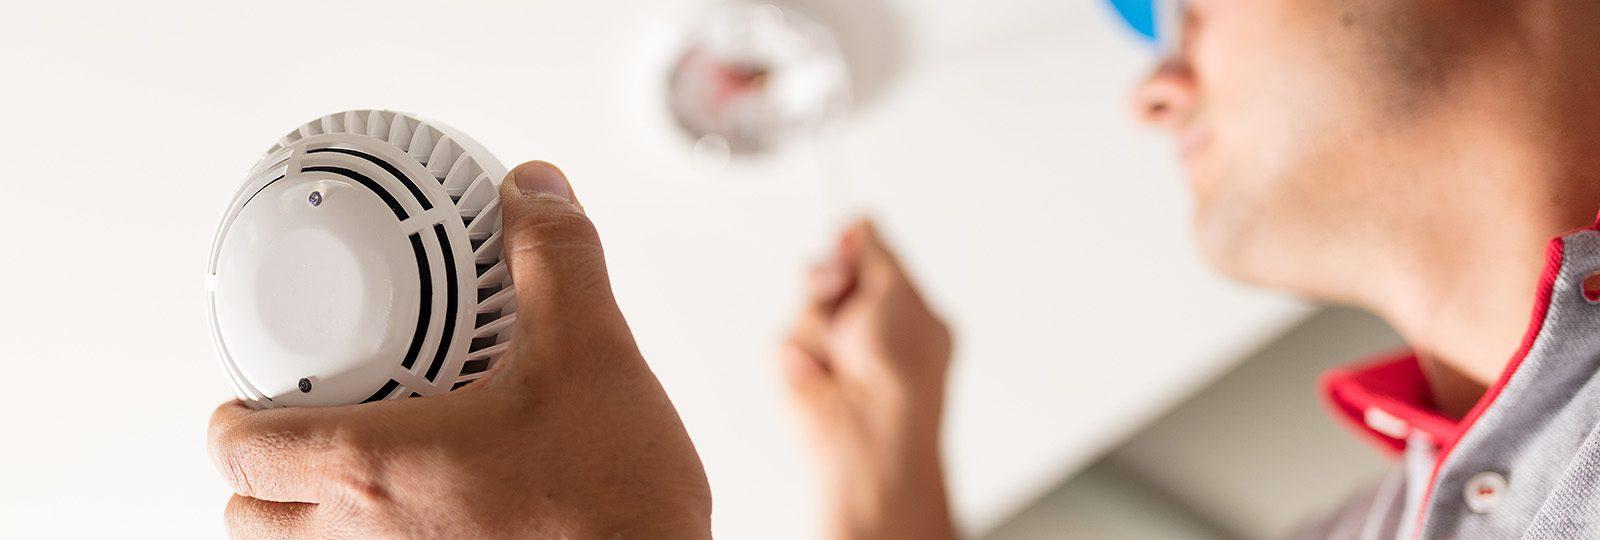 Man installing a smoke alarm on a ceiling